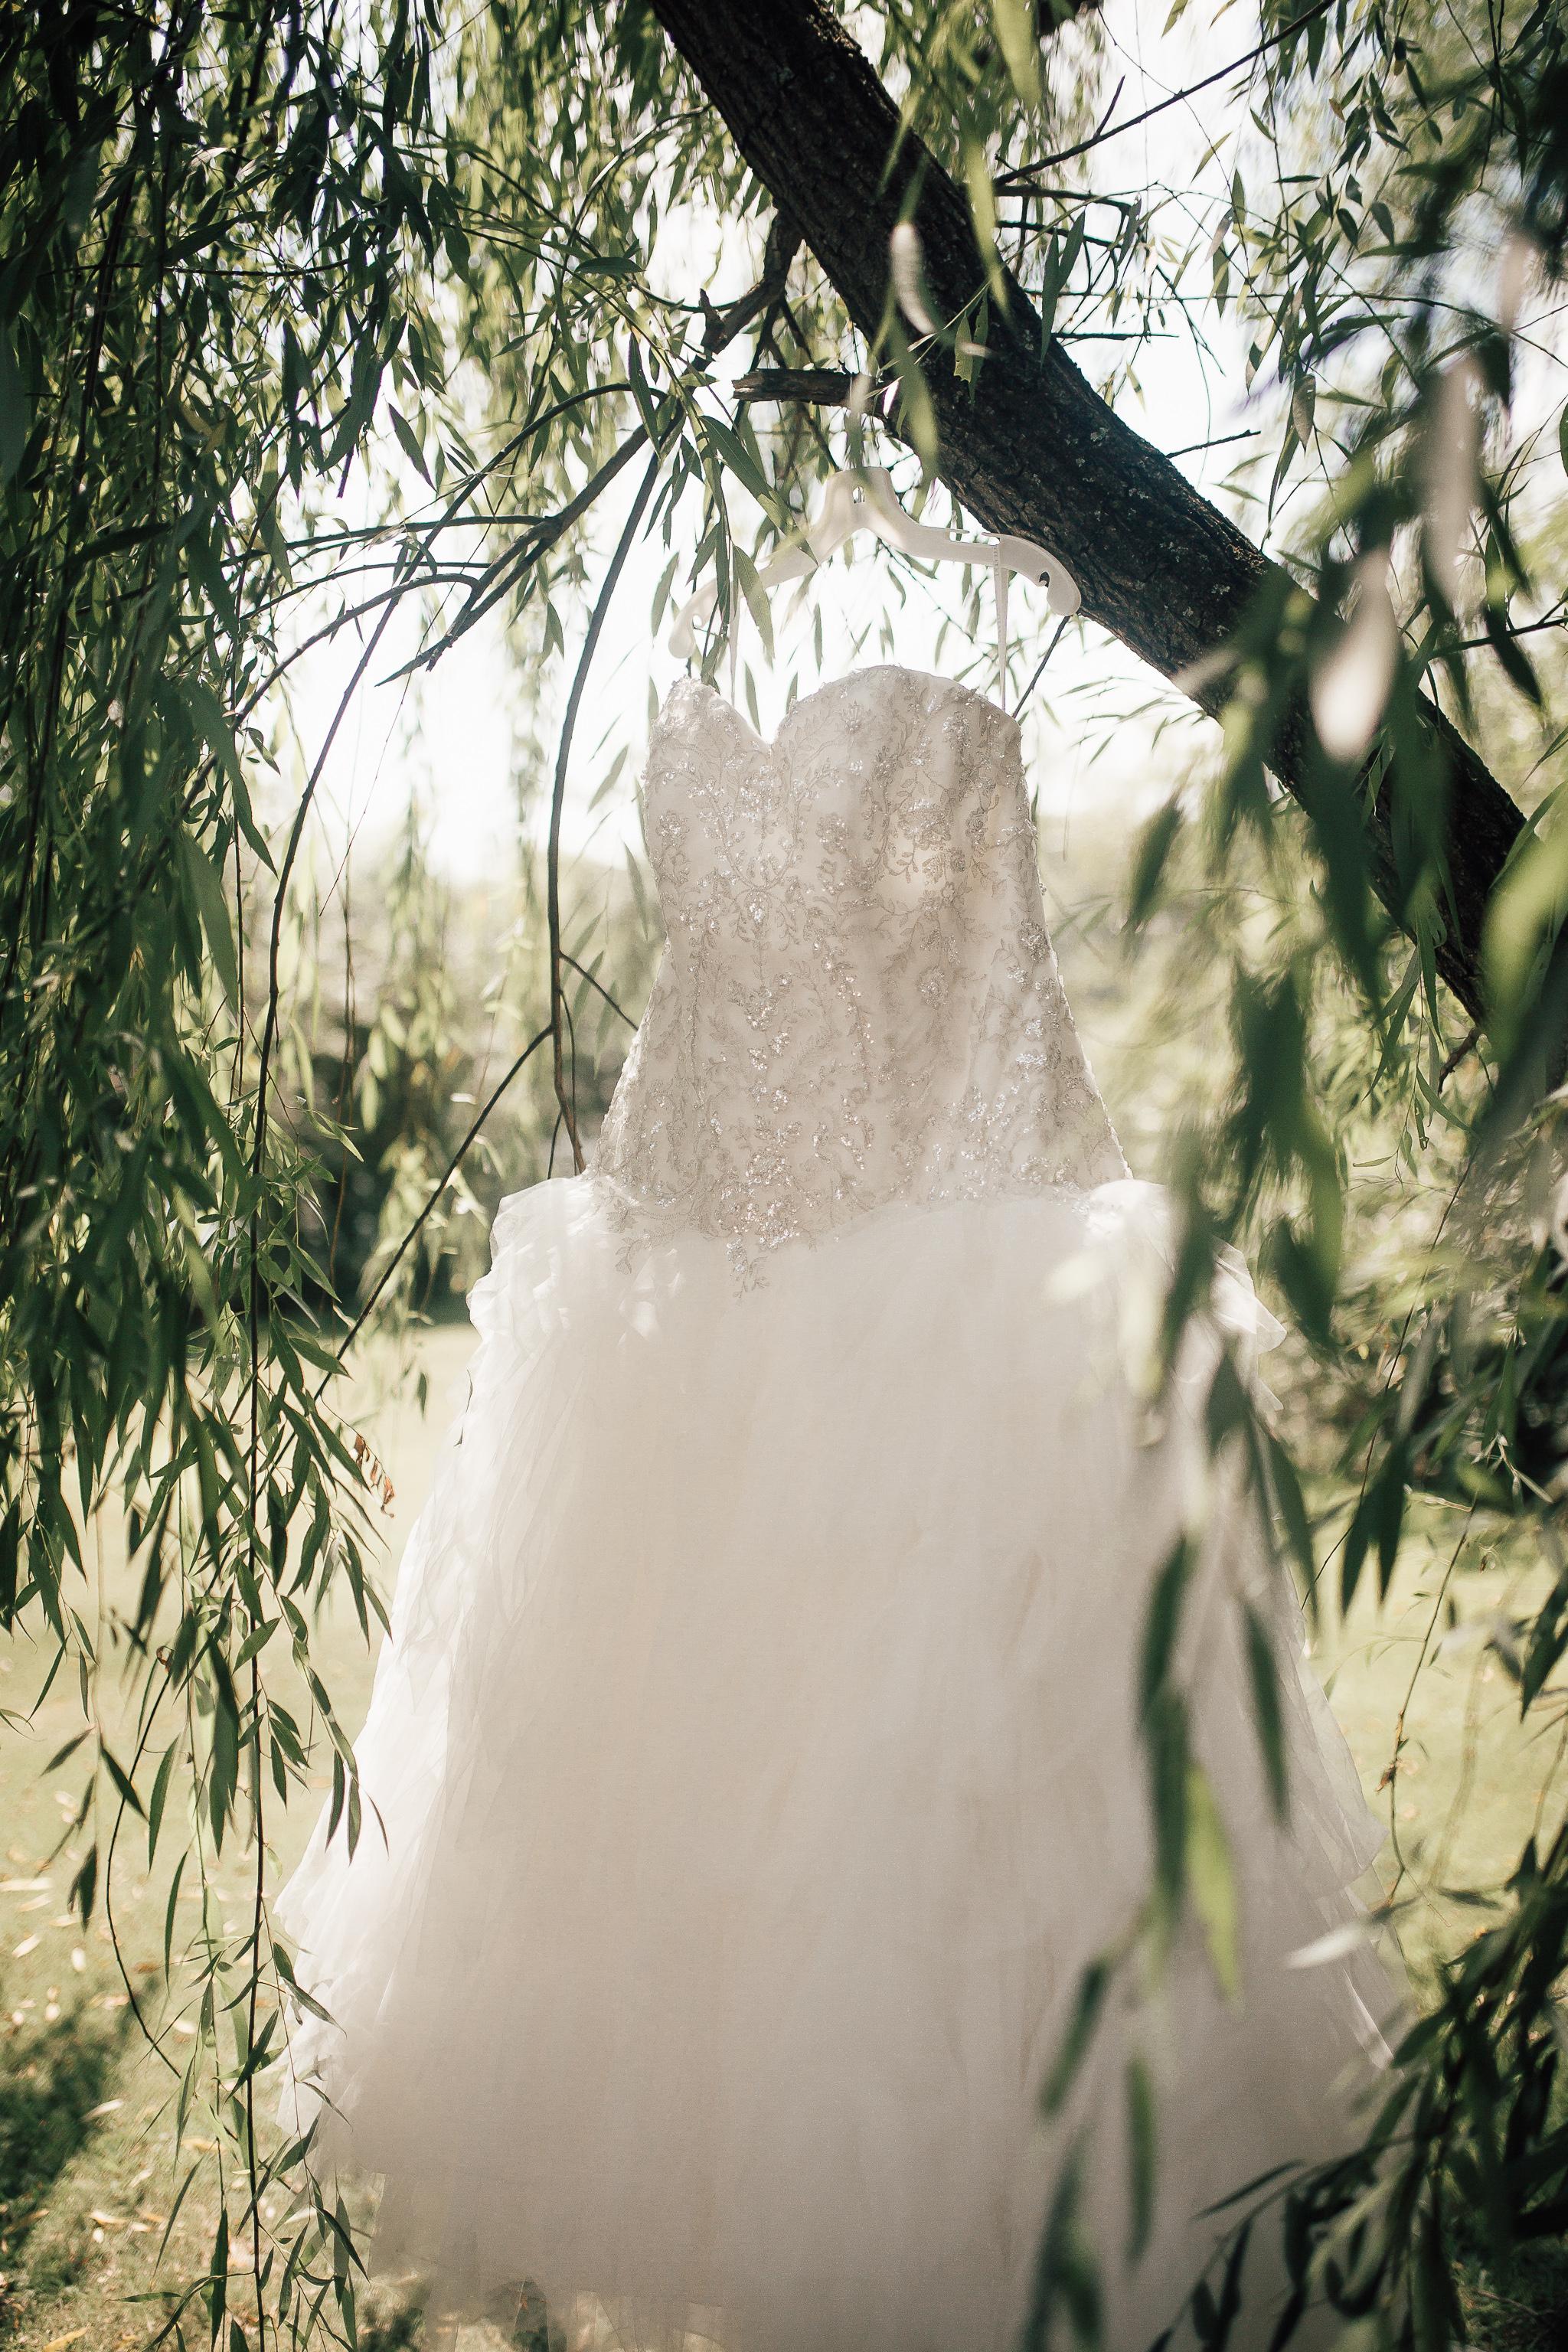 cassie-cook-photography-memphis-wedding-photographer-fountain-south-inn-olive-branch-ms-davids-bridal-wedding-dress